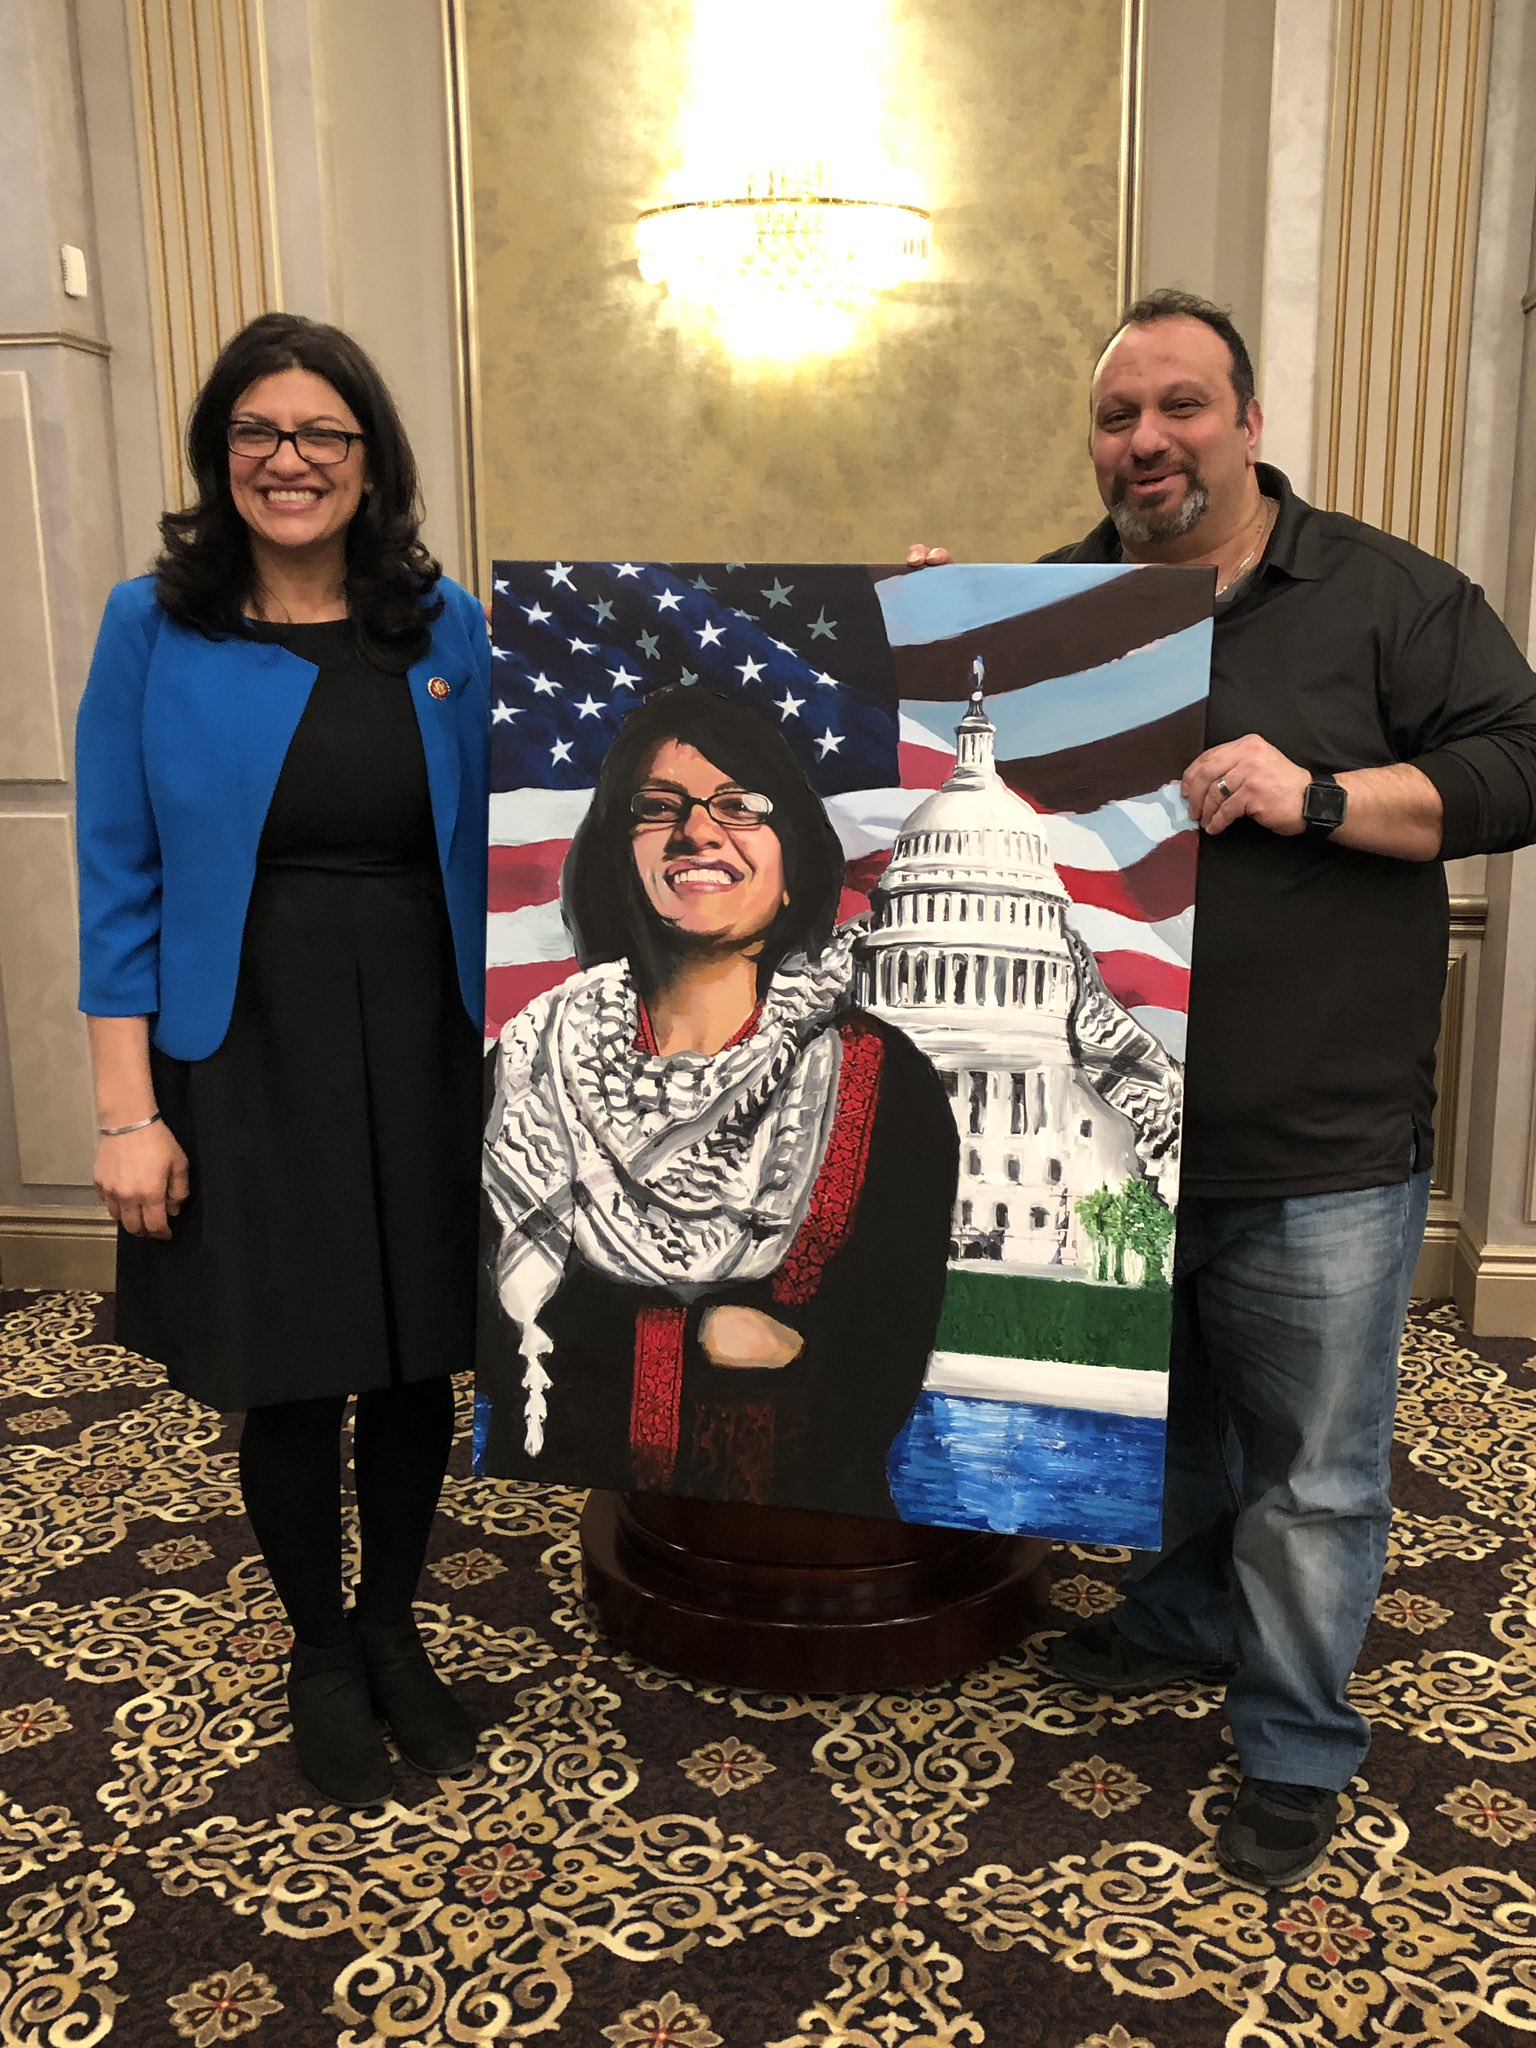 Jewish groups condemn Rashida Tlaib over ties to radical pro-Hezbollah, anti-Israel activist